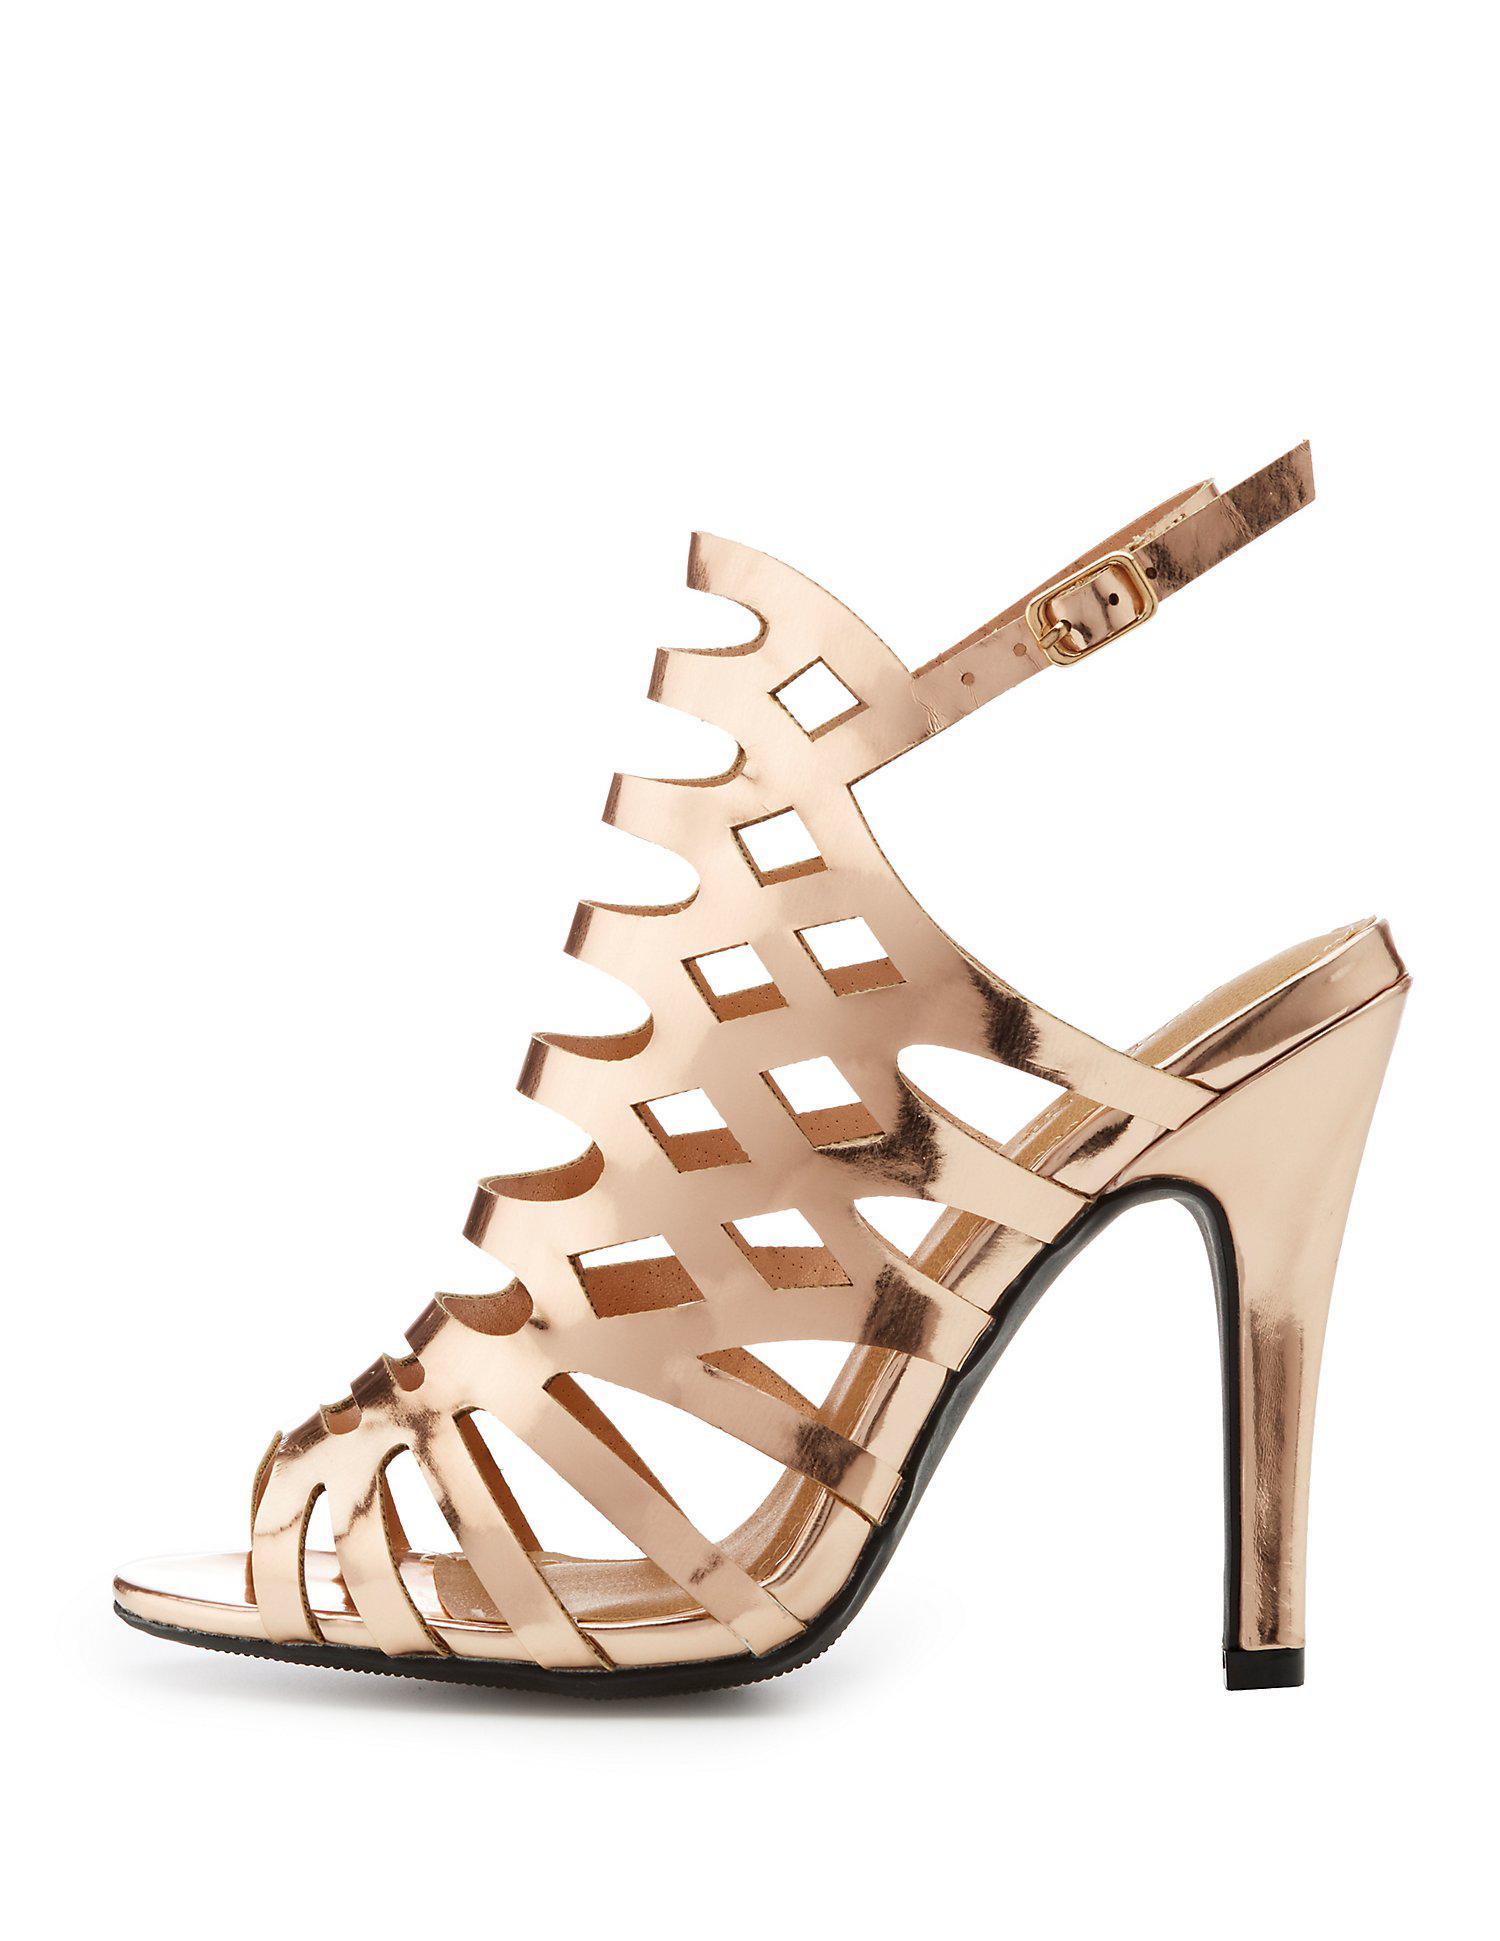 67a6c461a20f Lyst - Charlotte Russe Wide Width Laser Cut Dress Sandals